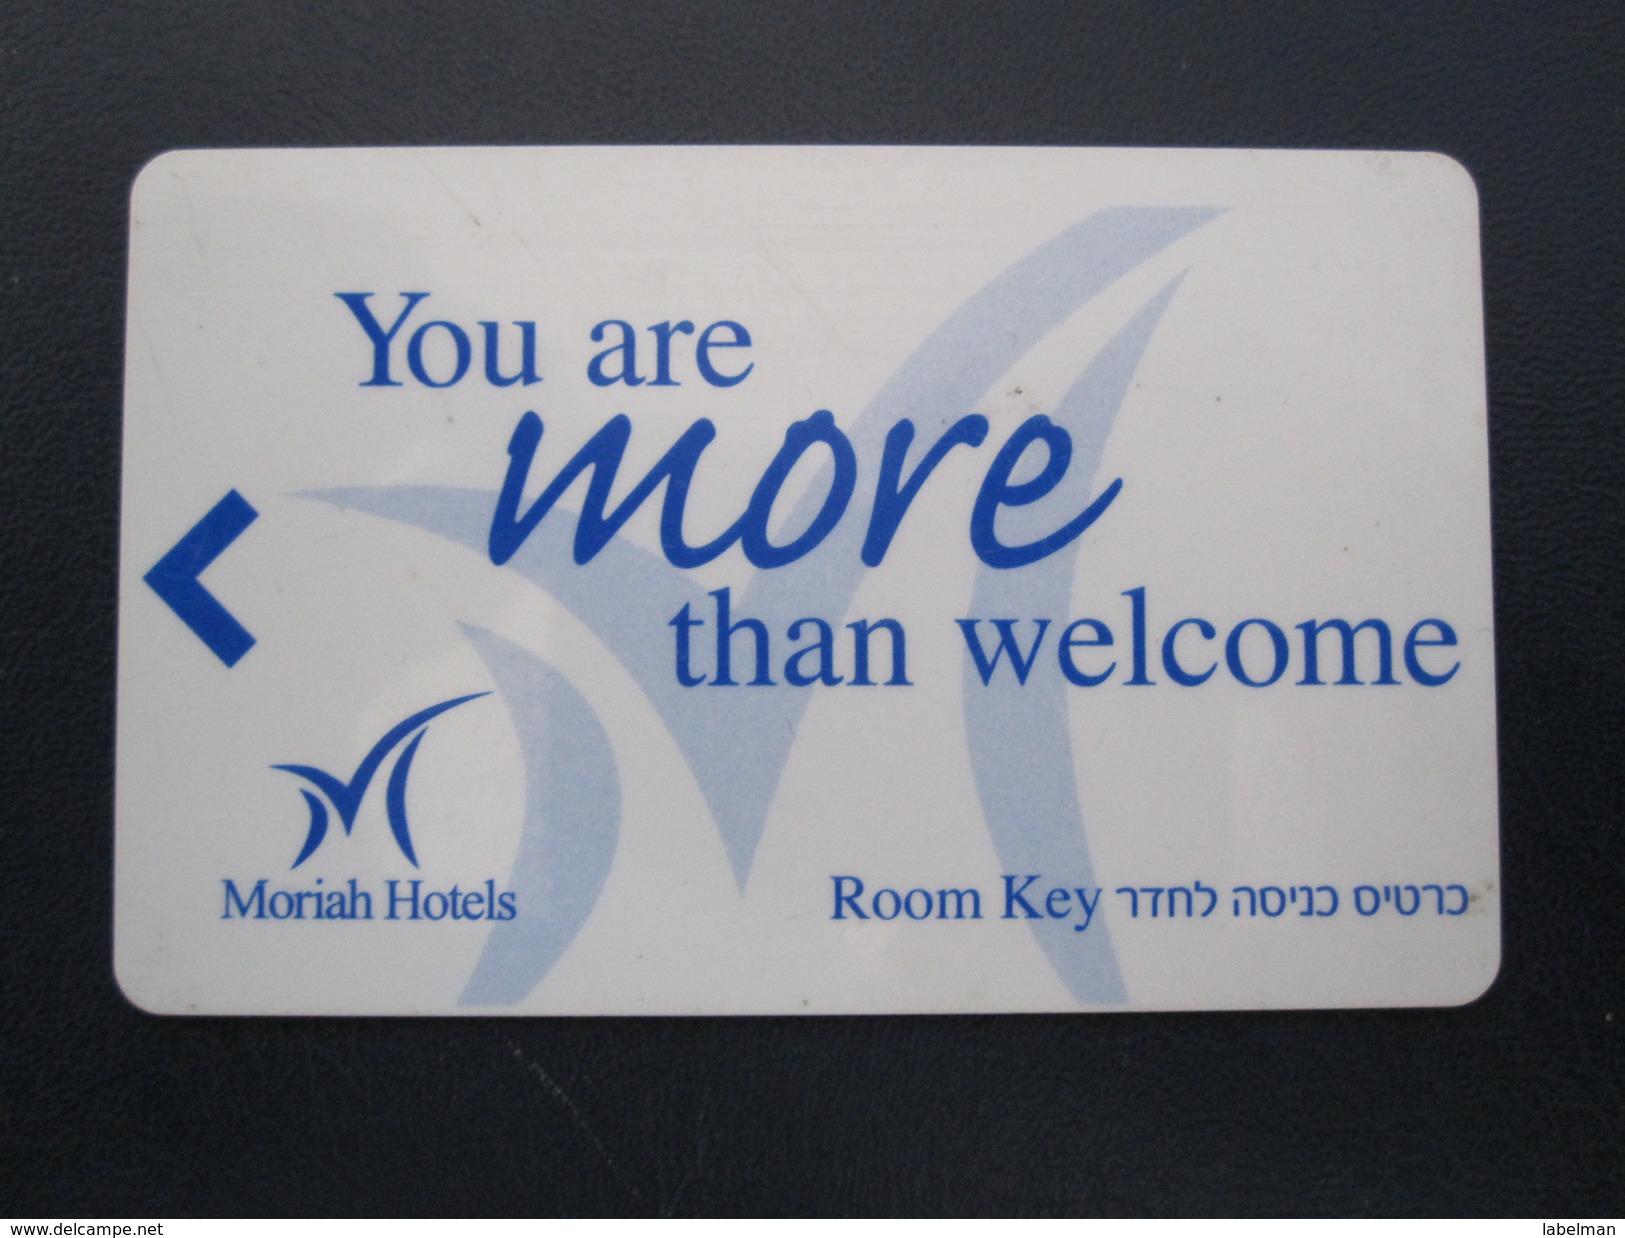 HOTEL MOTEL MOTOR HOUSE CLUB INN MORIAH TEL AVIV TIBERIAS DEAD SEA HAIFA JERUSALEM TIBERIAS EILAT KEY TOWEL CARD ISRAEL - Hotel Labels